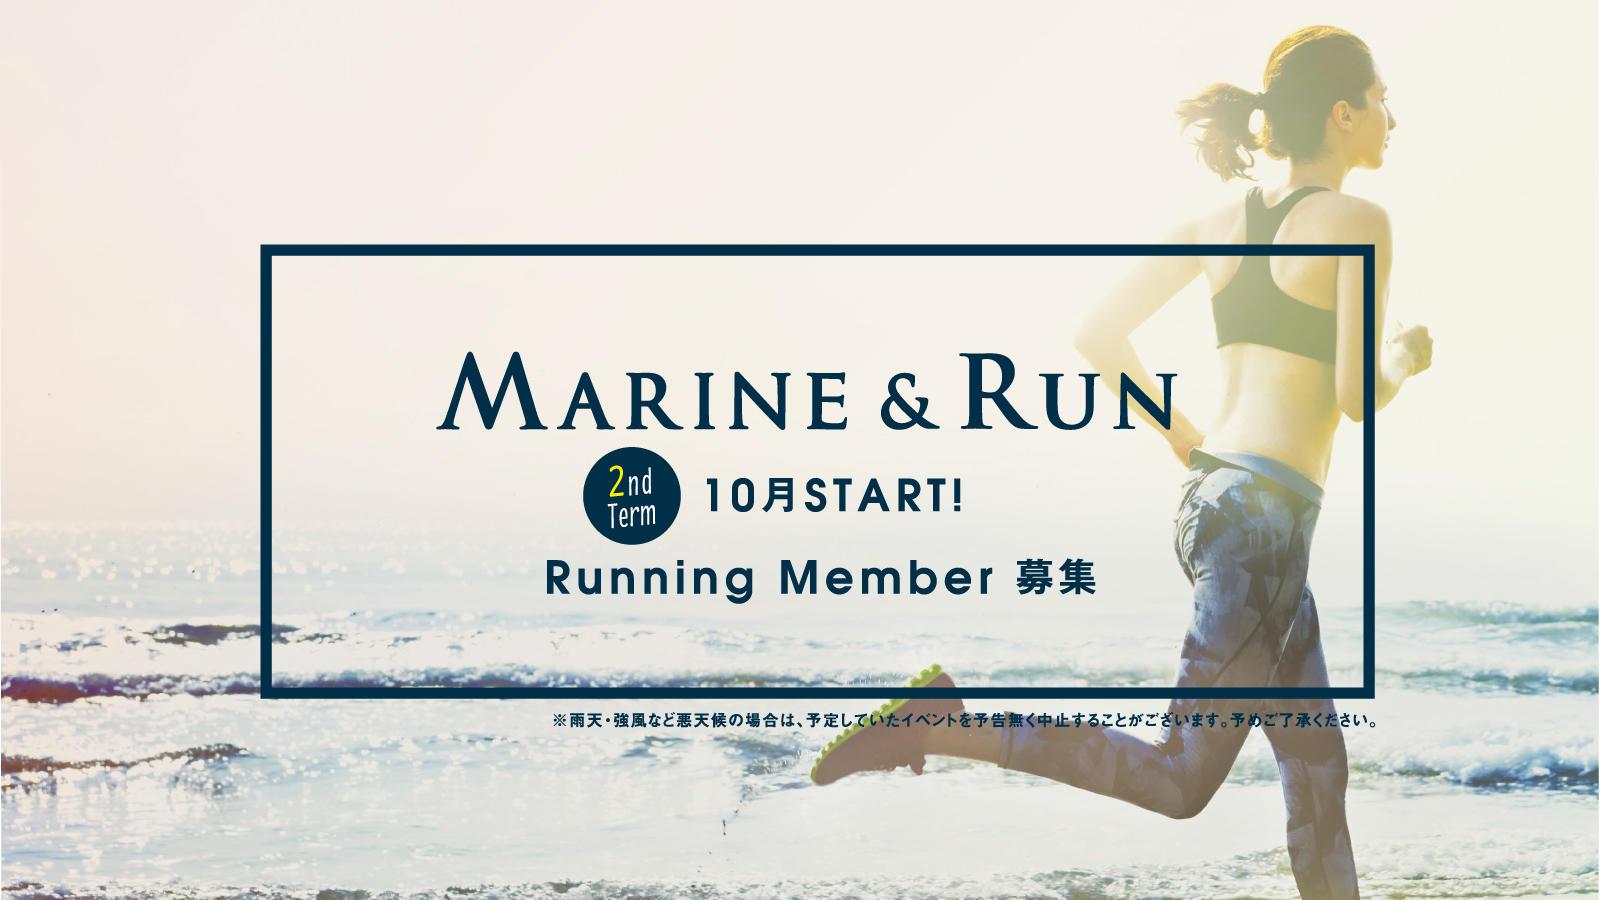 「MARINE&RUN」2nd Term第6回目 3/15開催